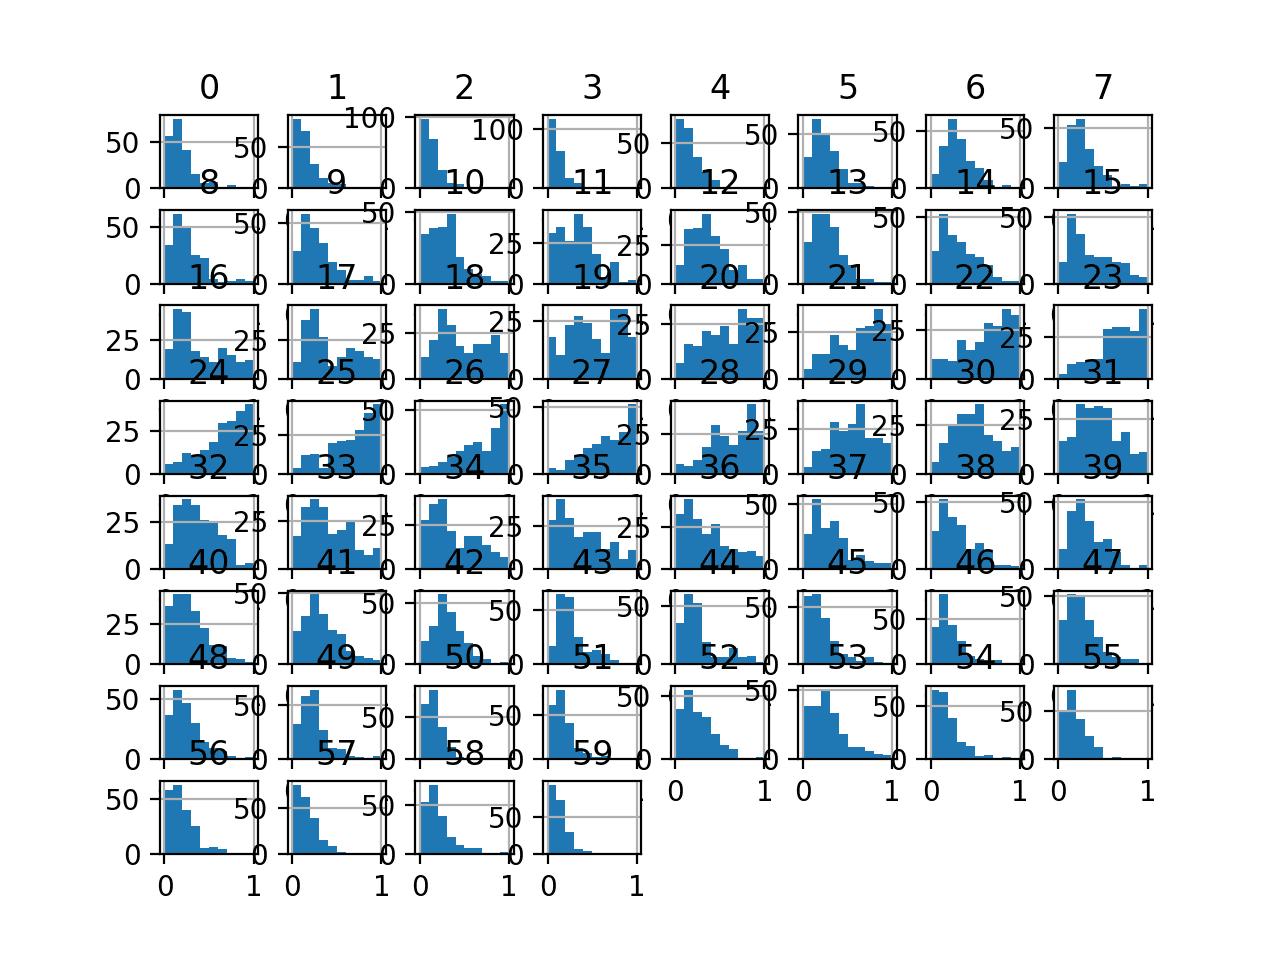 Histogram Plots of MinMaxScaler Transformed Input Variables for the Sonar Dataset